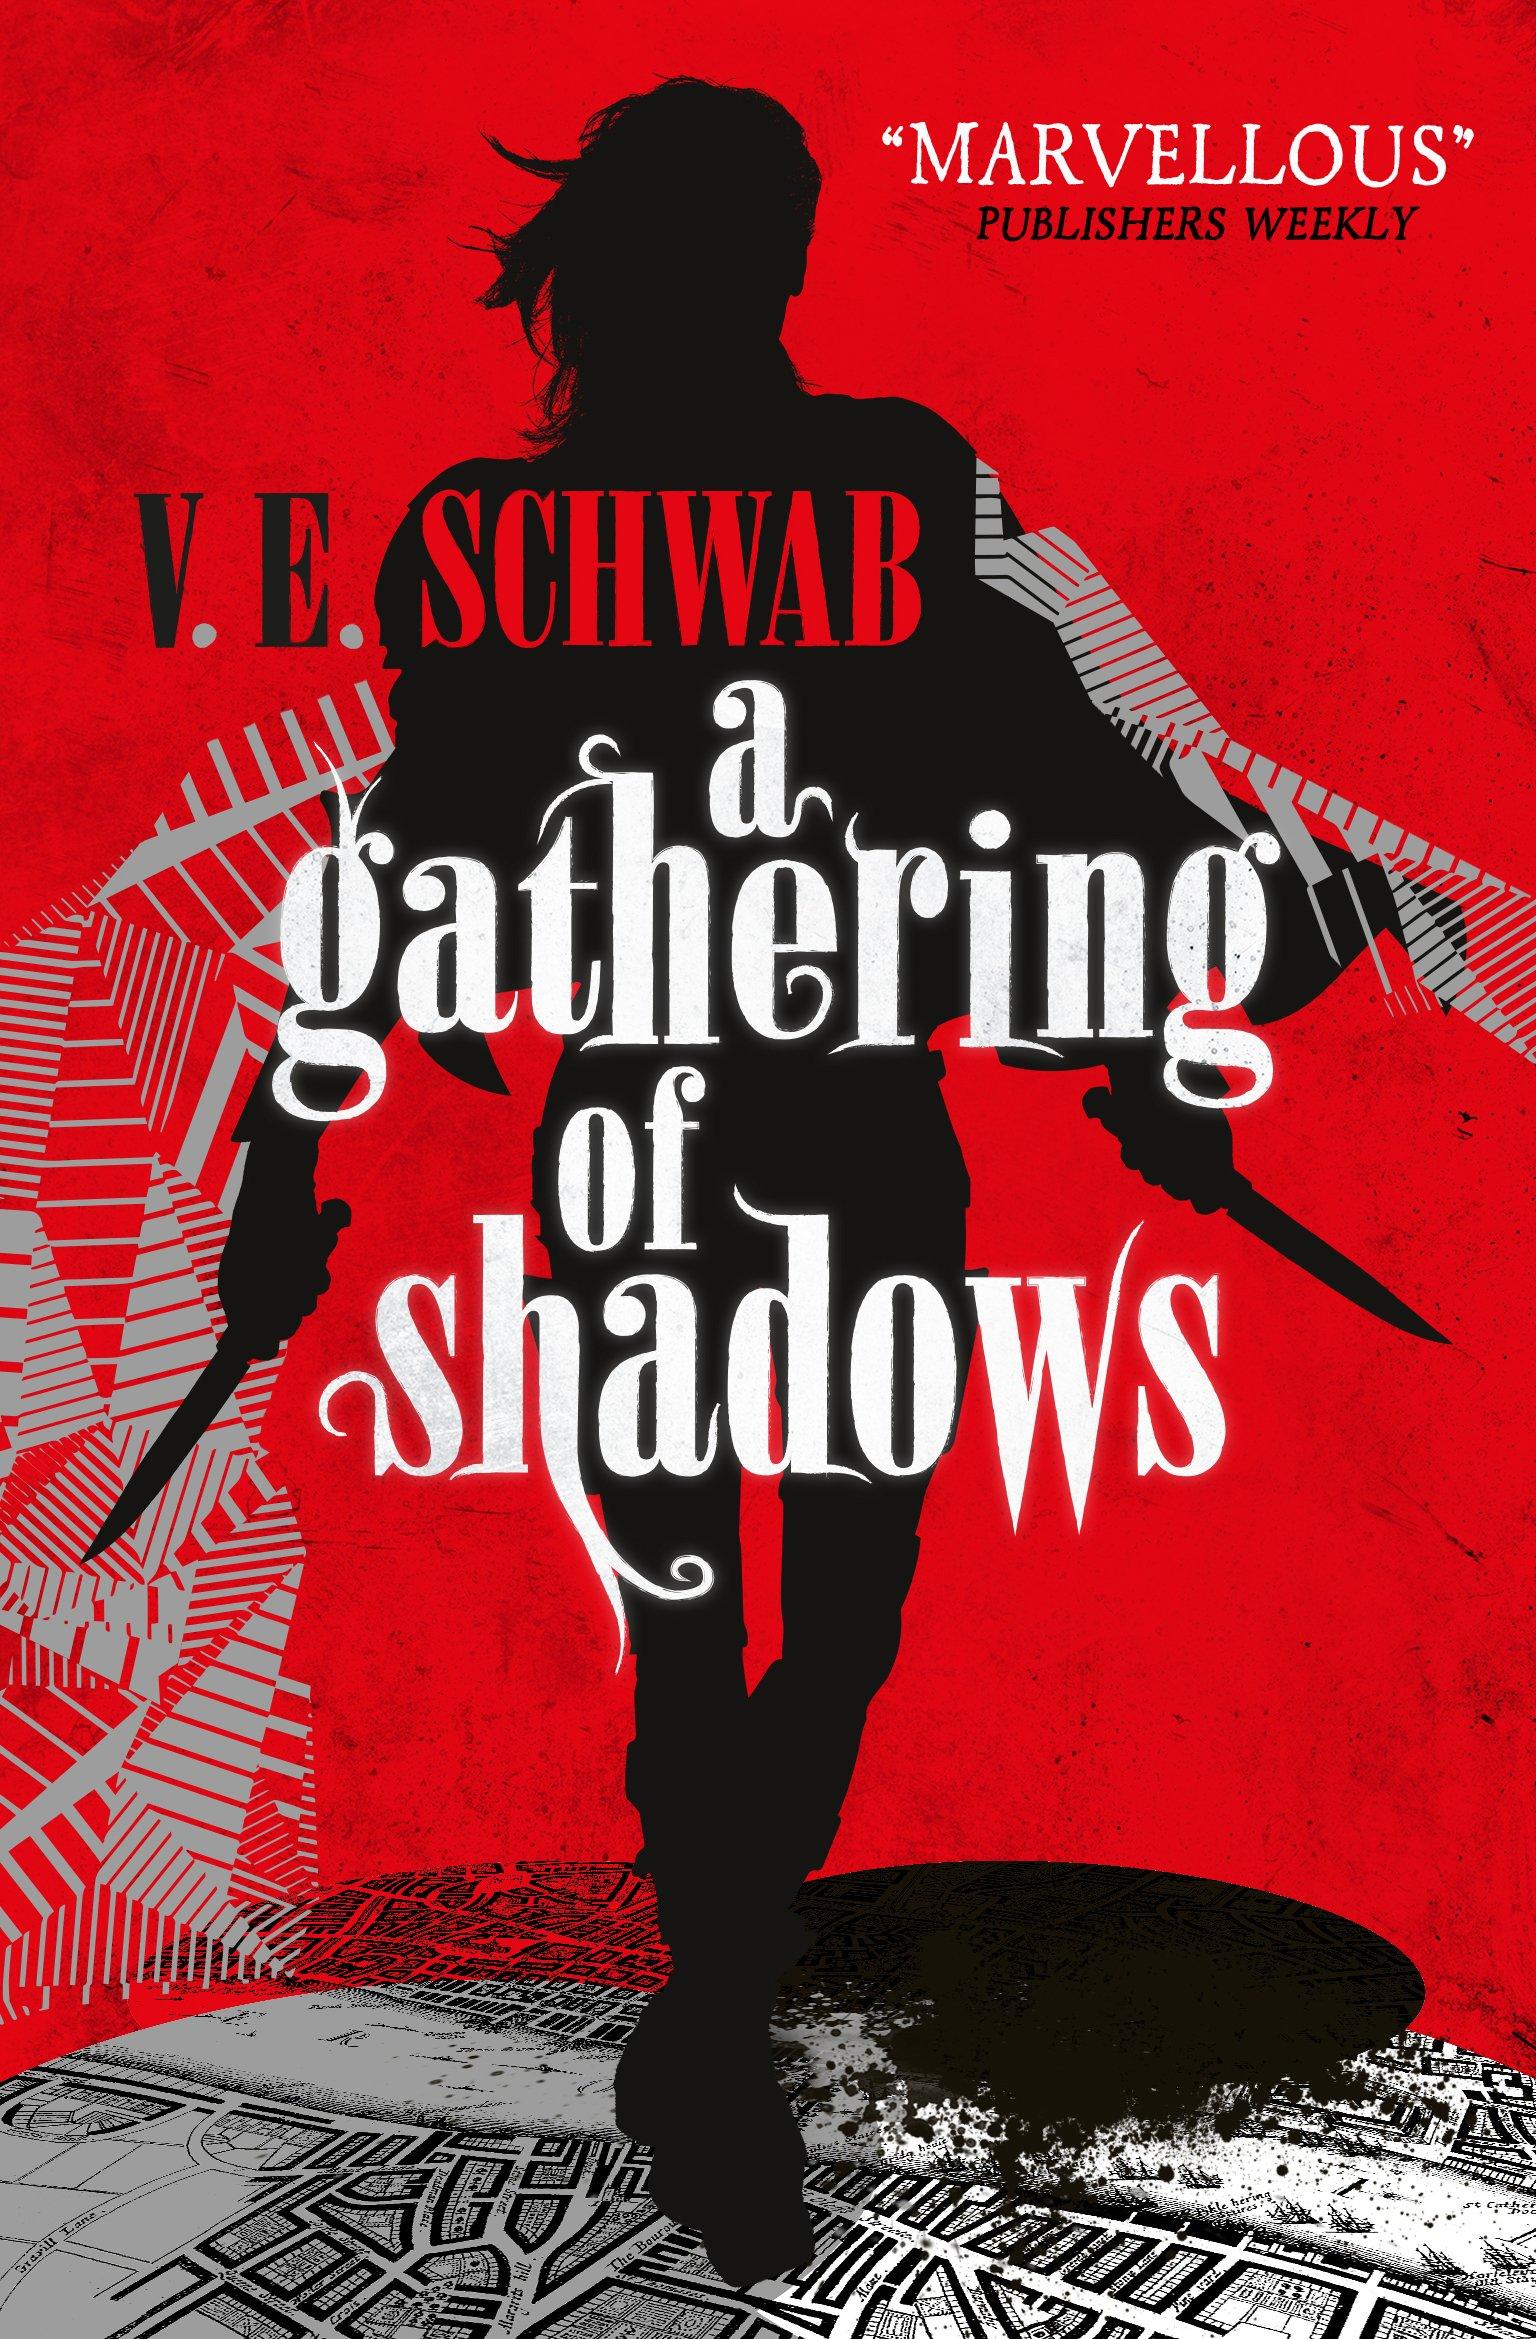 A Gathering of Shadows (A Darker Shade of Magic #2): Amazon.co.uk: V. E.  Schwab, Victoria Schwab: 9781783295425: Books